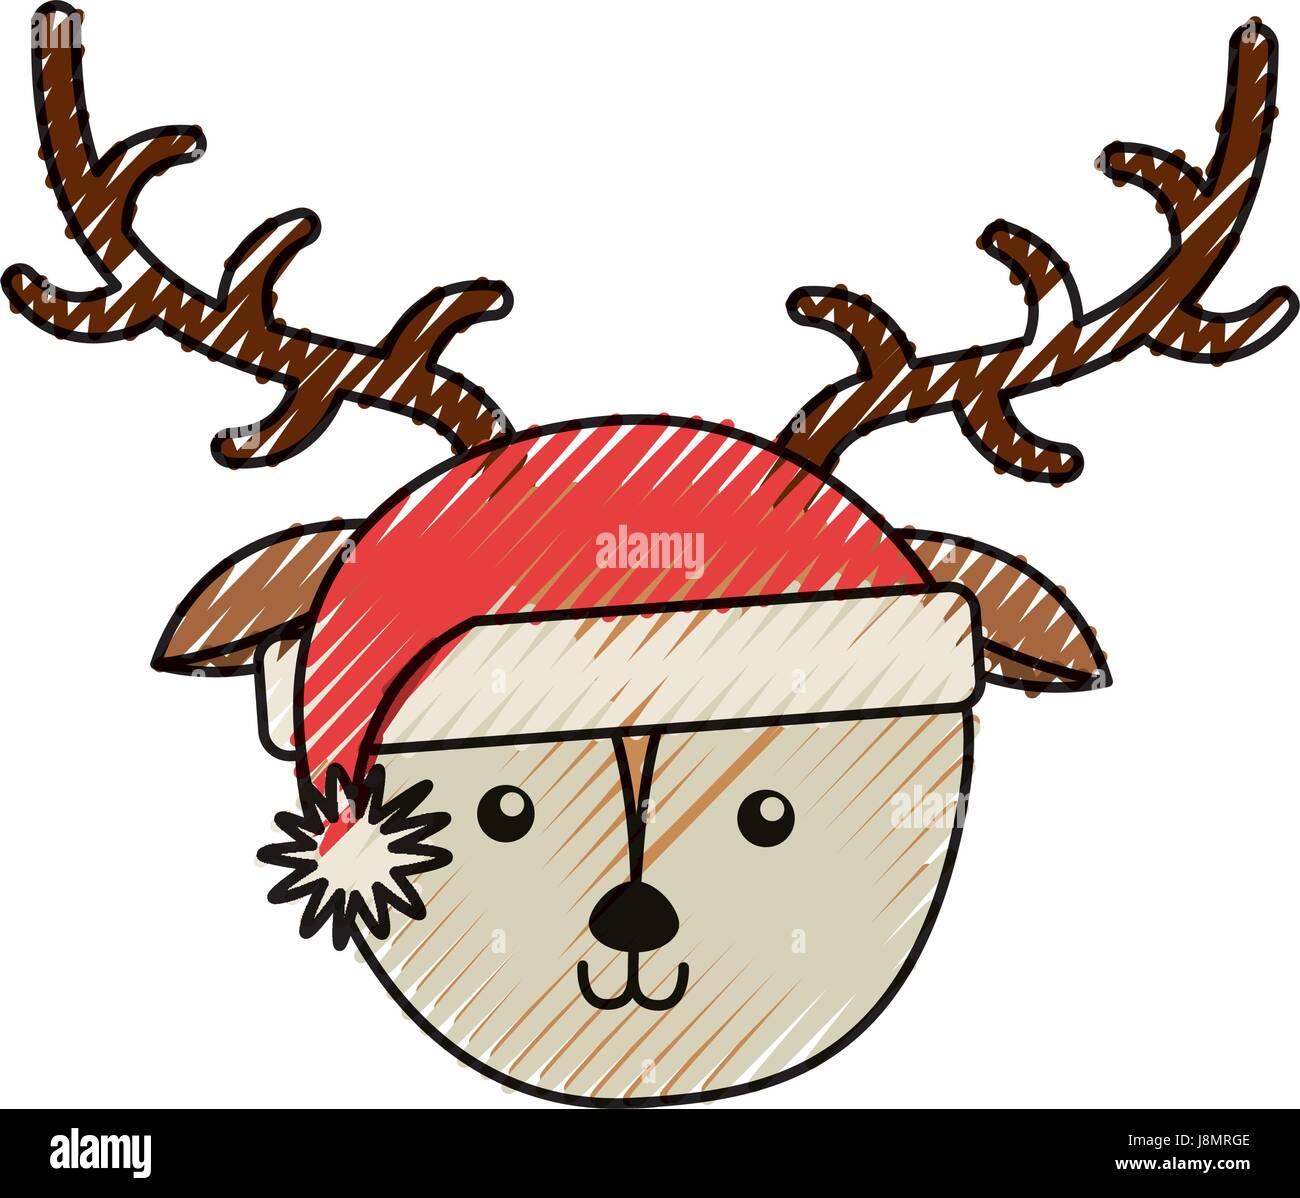 Merry Christmas Jump Deer Illustration Imagenes De Stock Merry - Ciervo-navidad